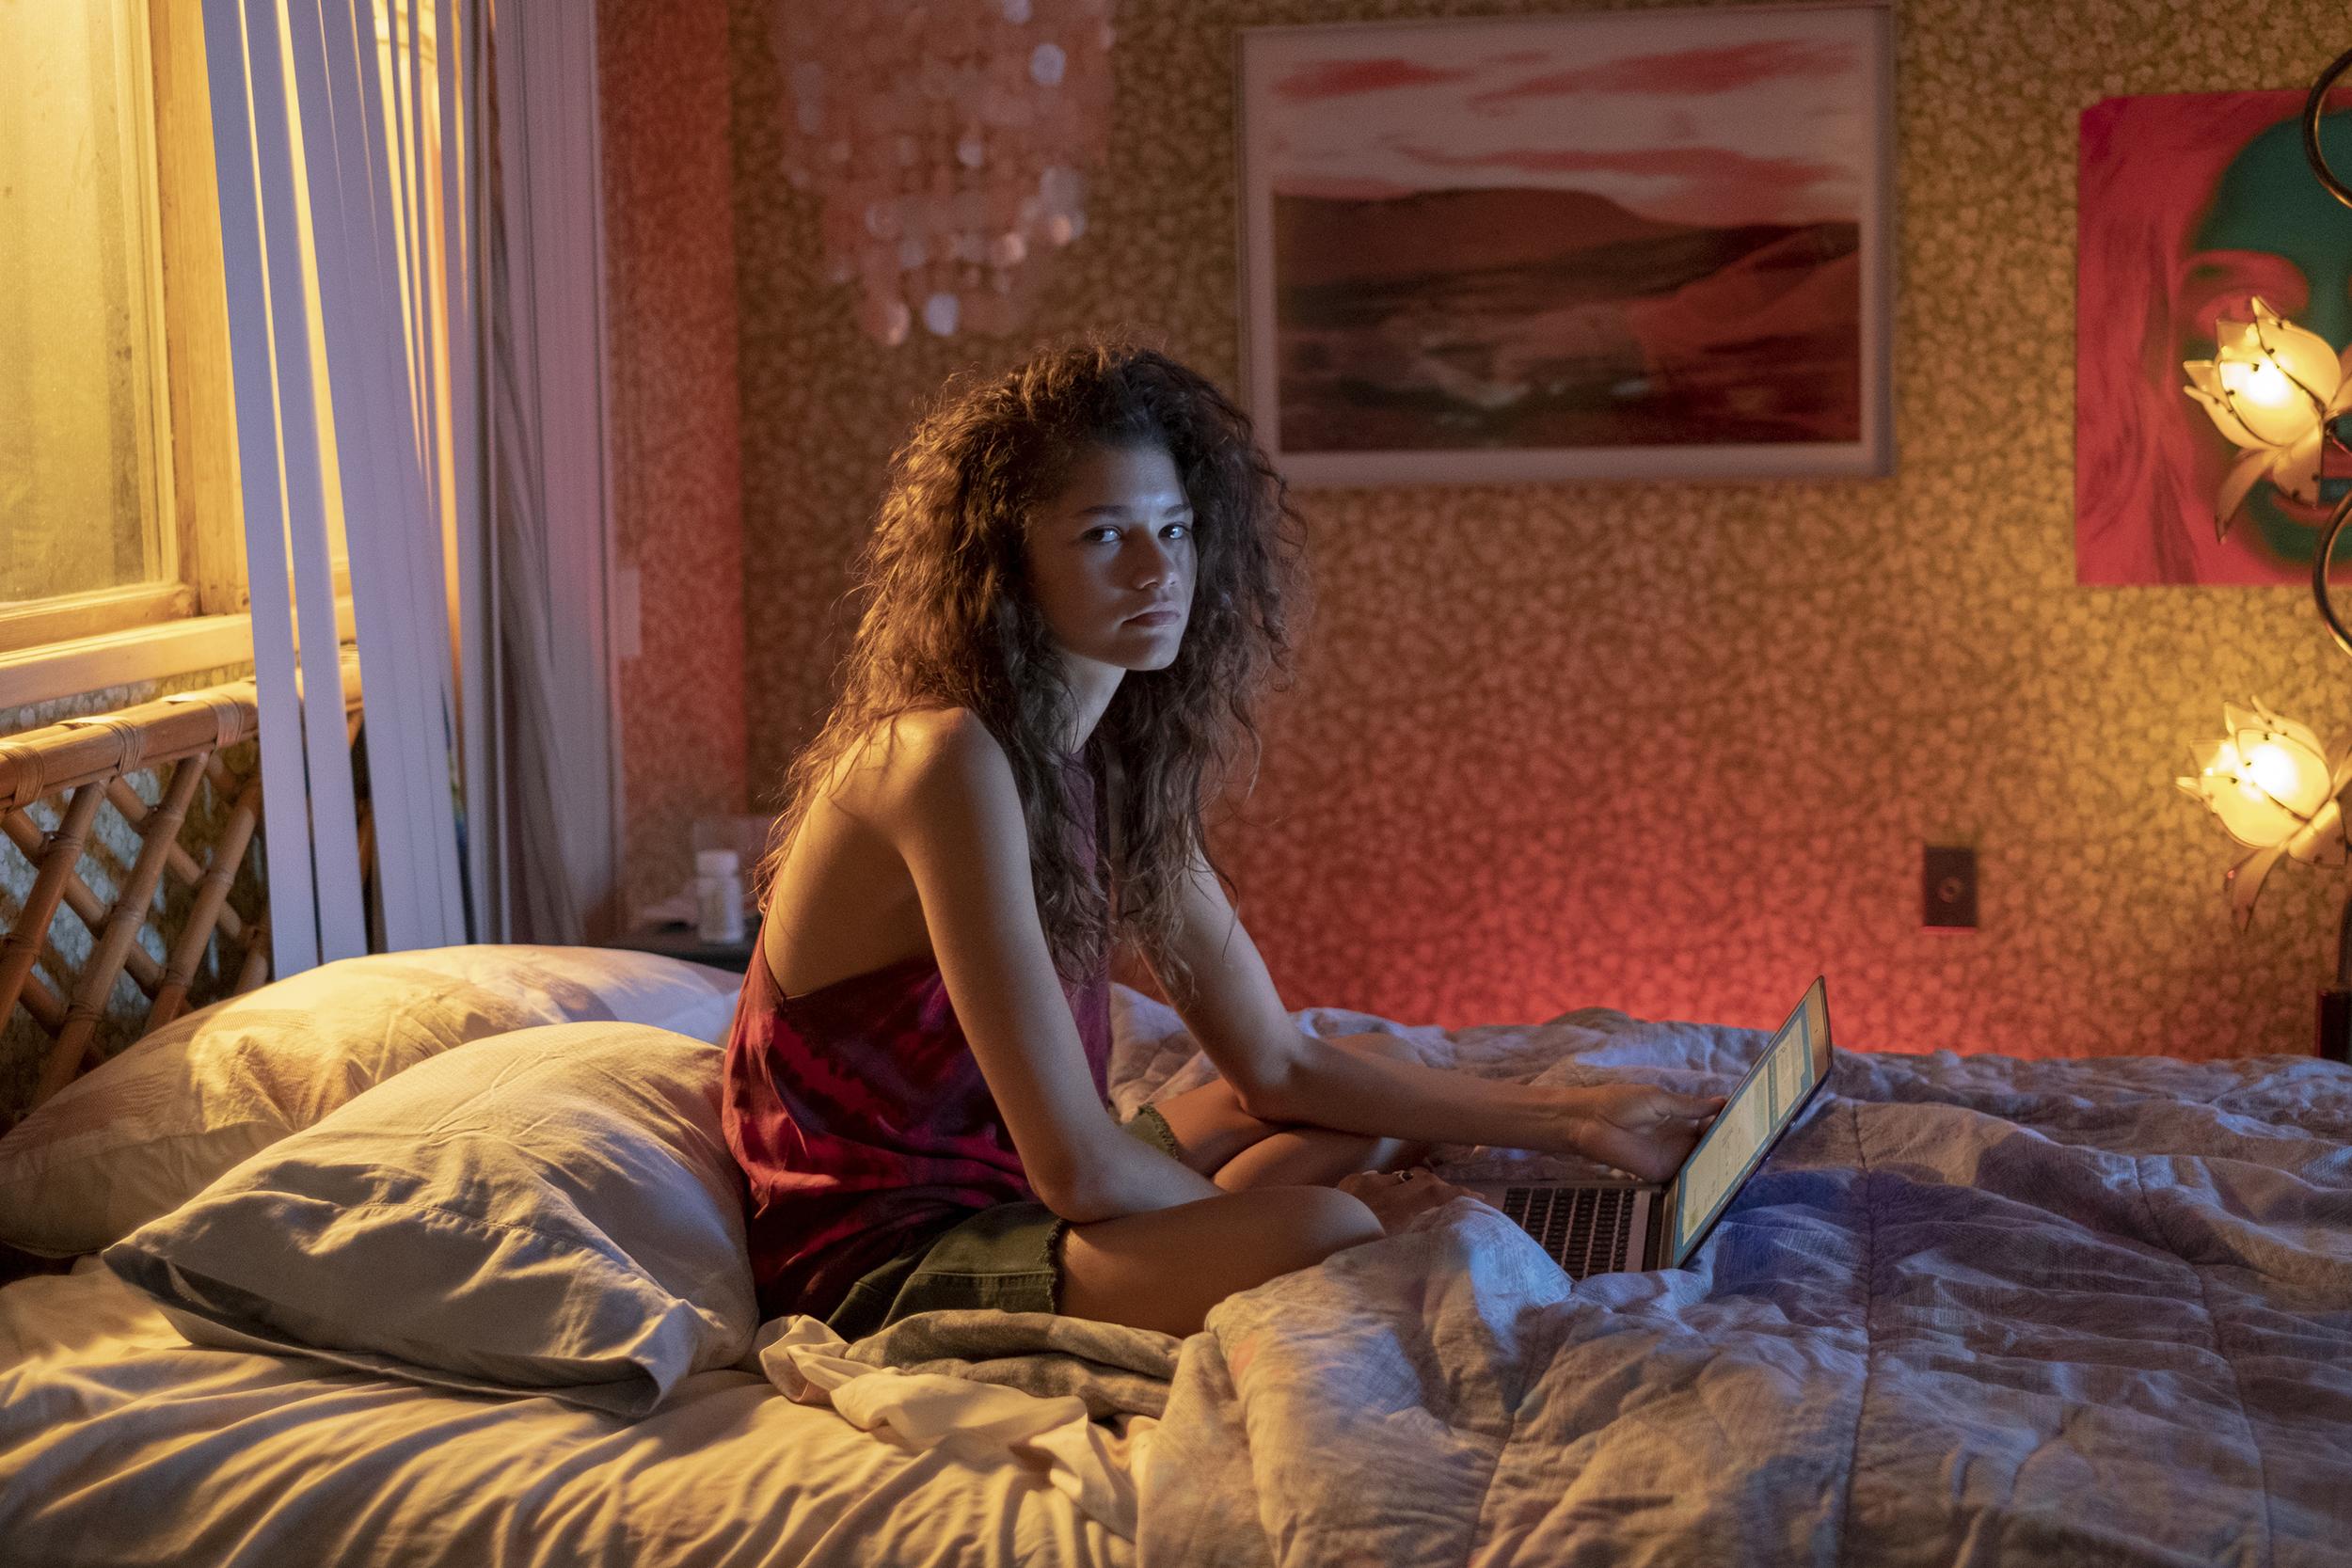 13 Rooms Porn Game Sex Scenes hbo's 'euphoria' is zendaya's chance to shine, controversies